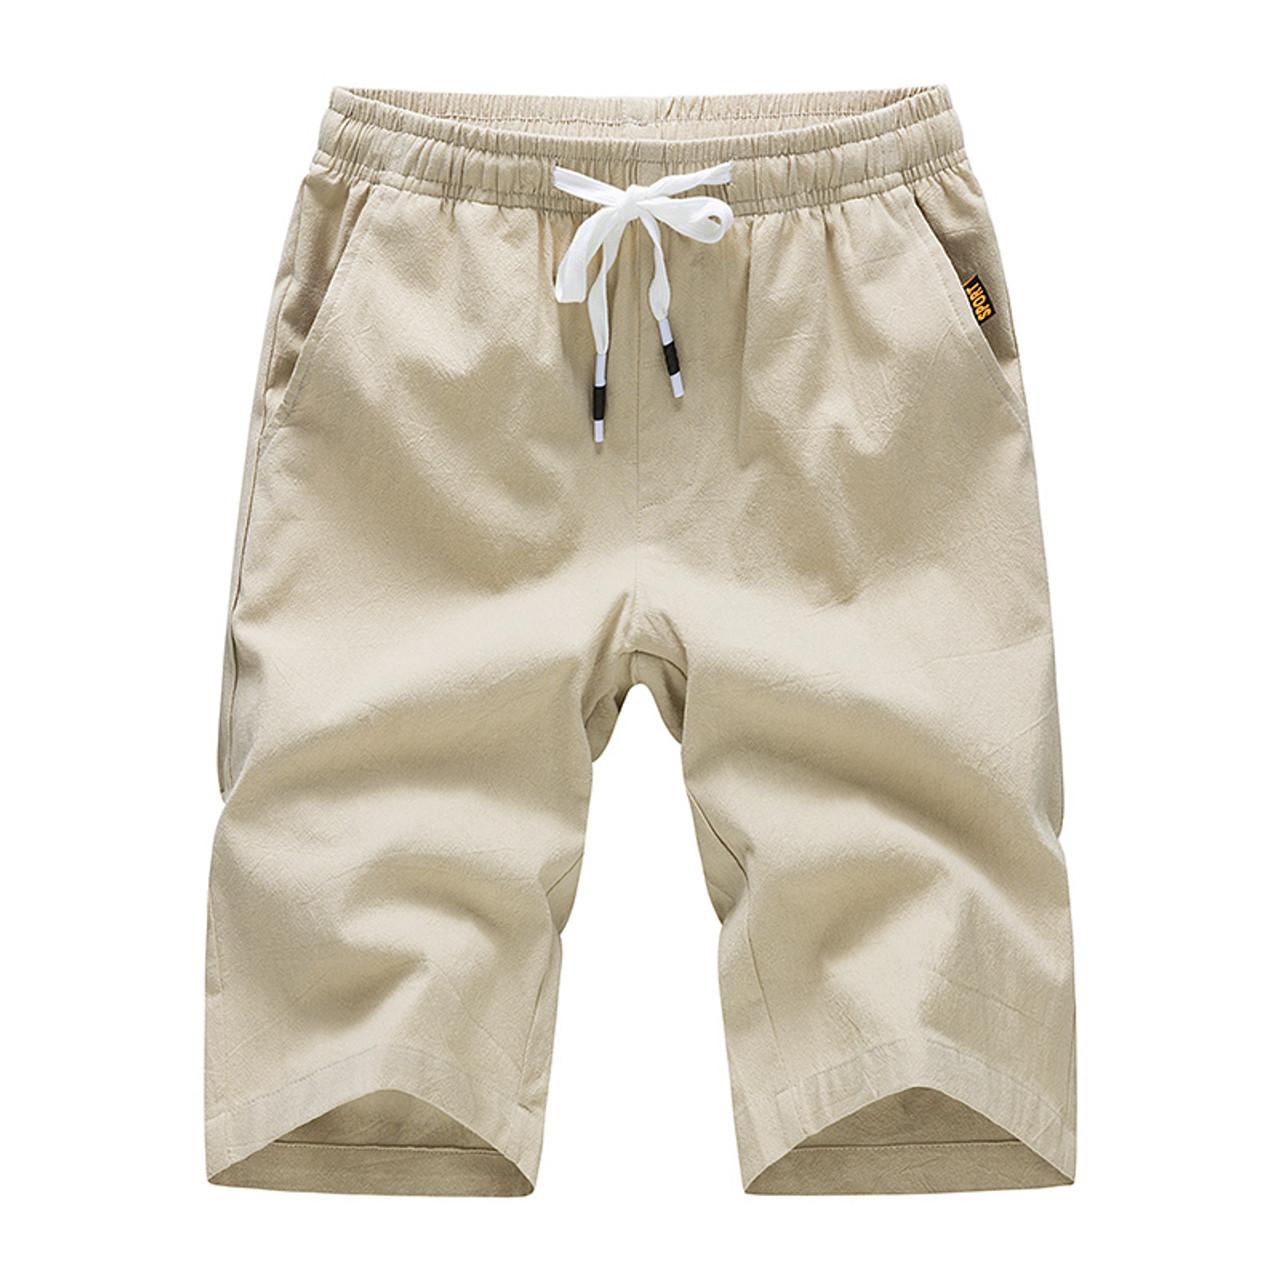 6d12afdd41 Cotton Slim Fit Casual Shorts Men Brand Boardshorts Drawstring Mens Short  Hot Sale Male Summer thin Bottoms Beach Short